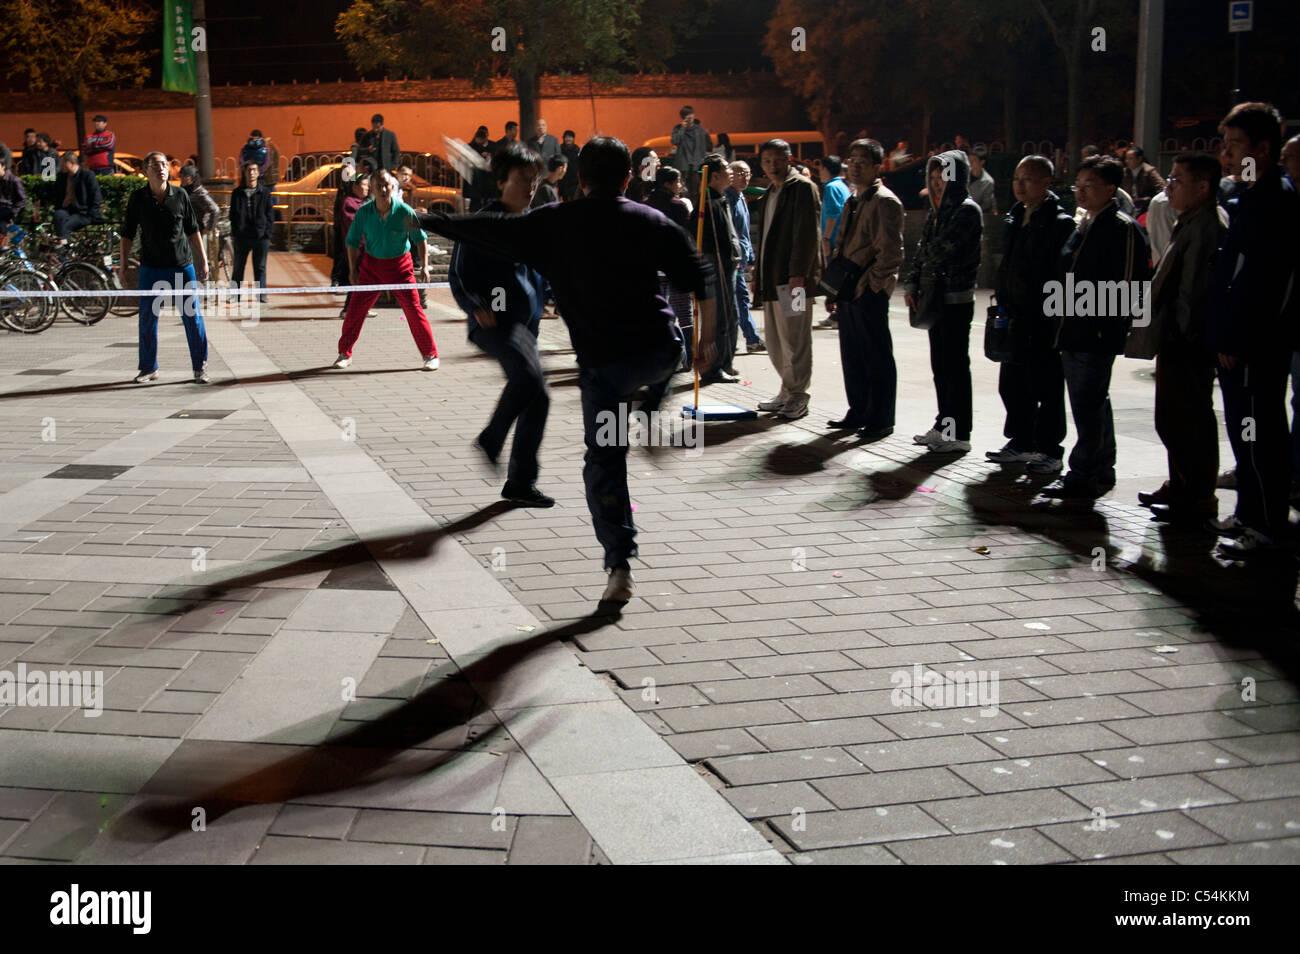 People playing feather kicker hacky sack, Back Lakes, Beijing, China - Stock Image